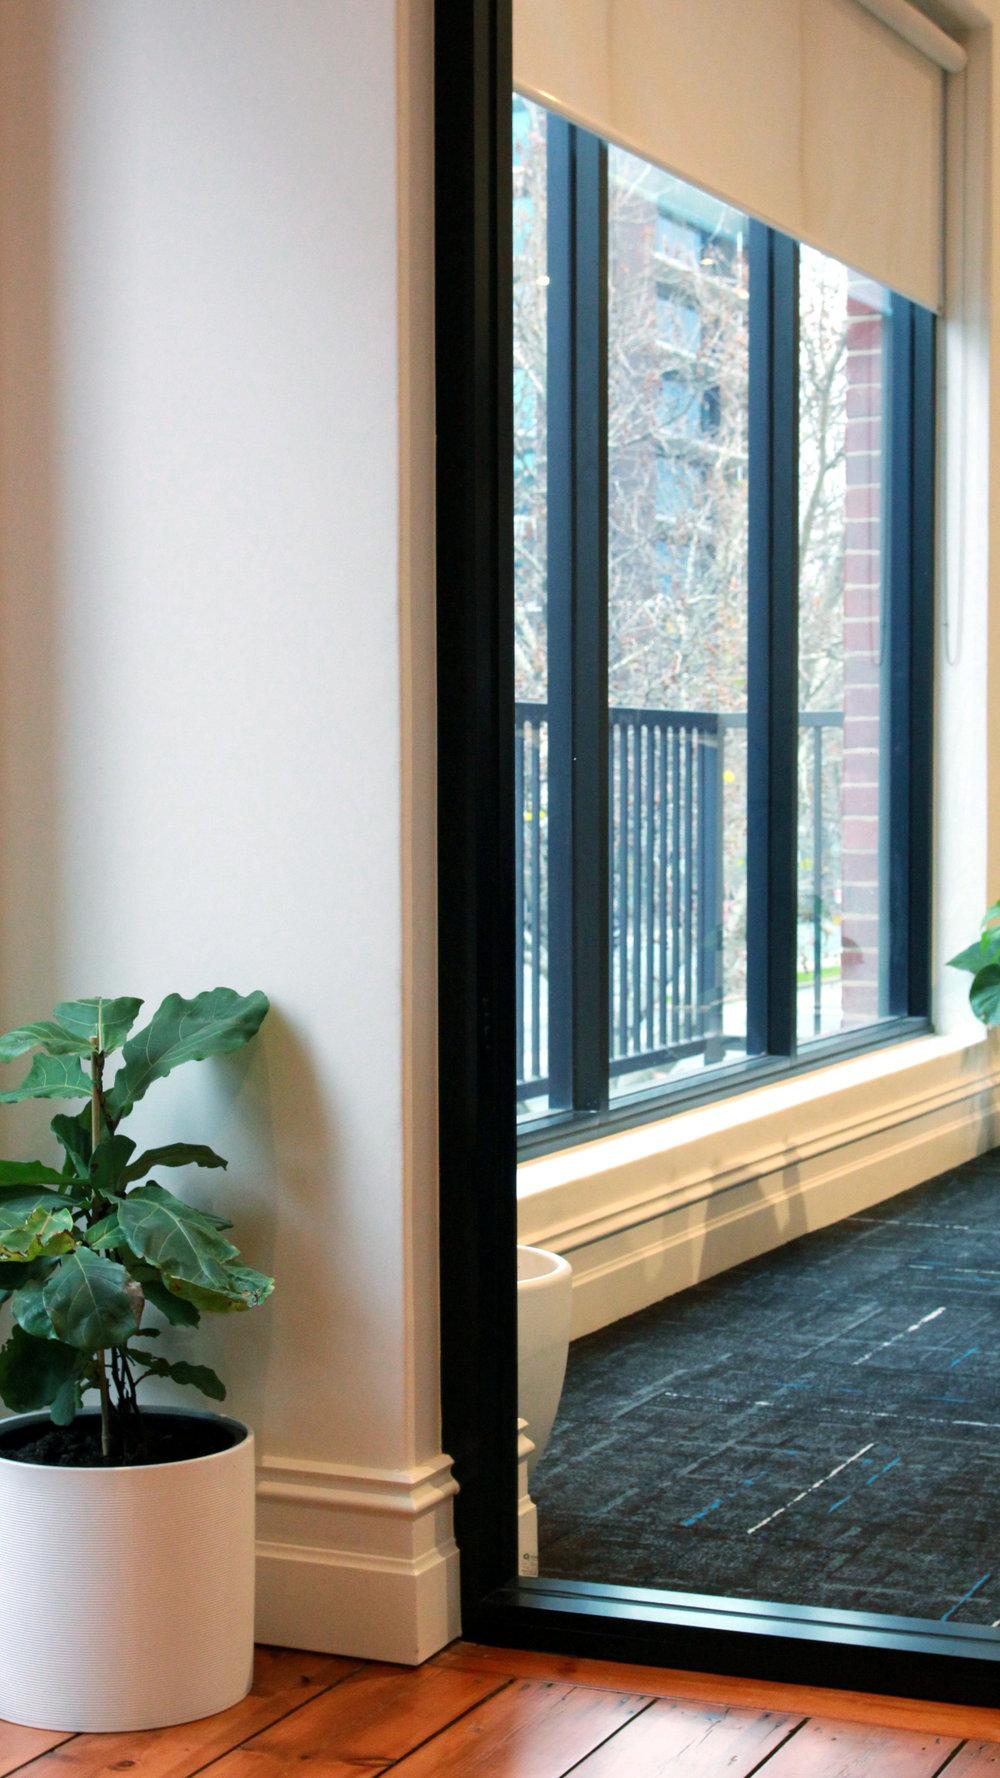 plant_window.jpg